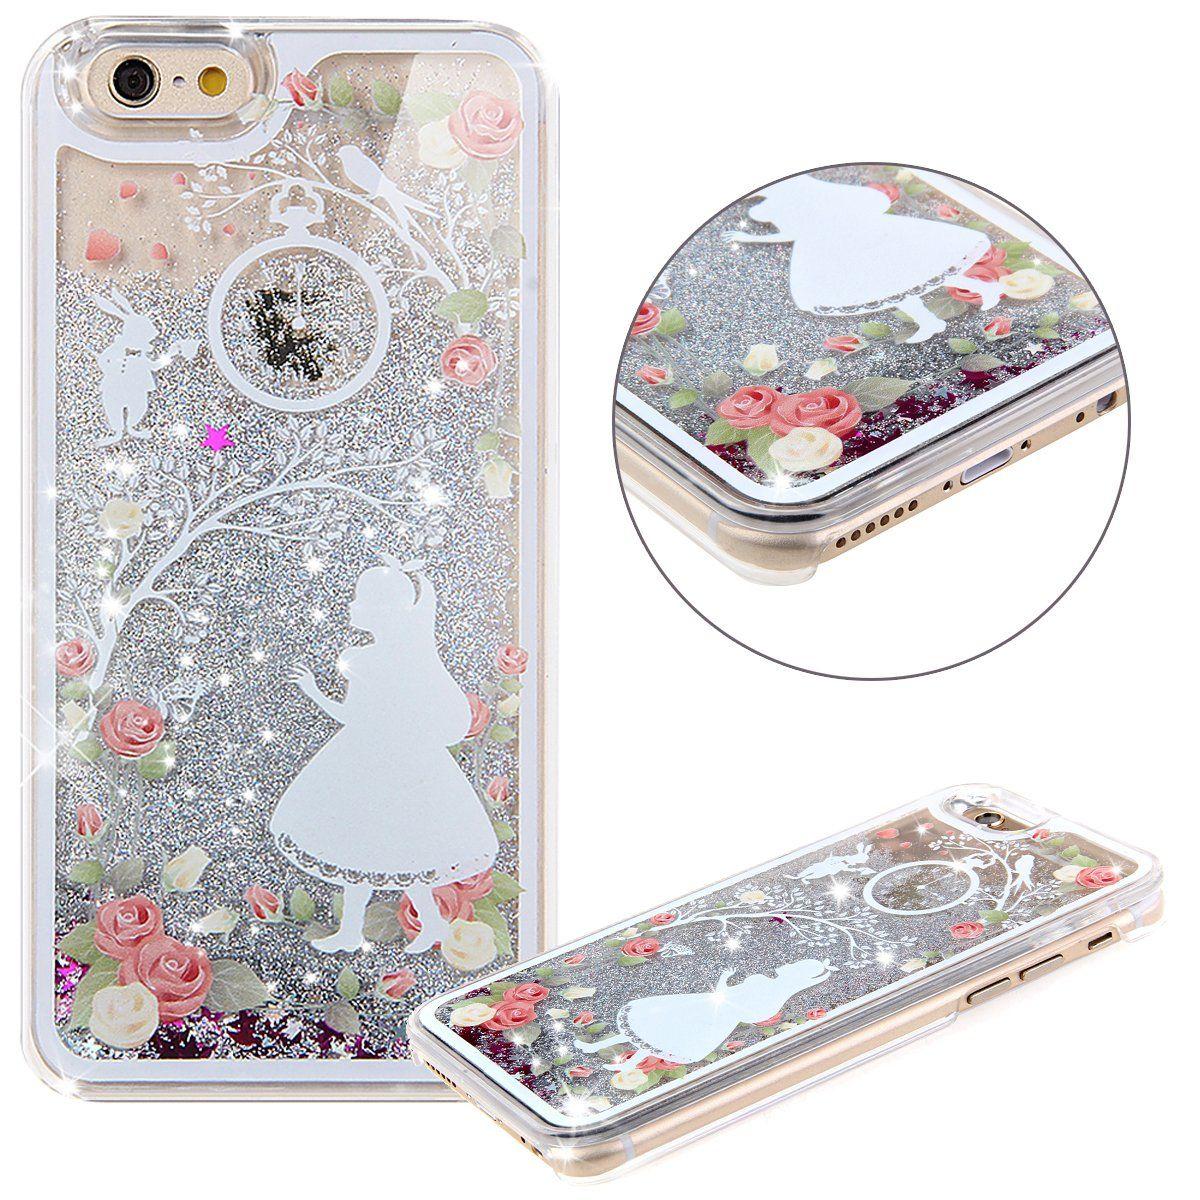 online retailer a5cda 81e8e Amazon.com: iPhone 5C Case,iPhone 5C Liquid Case,UZZO 3D Creative ...